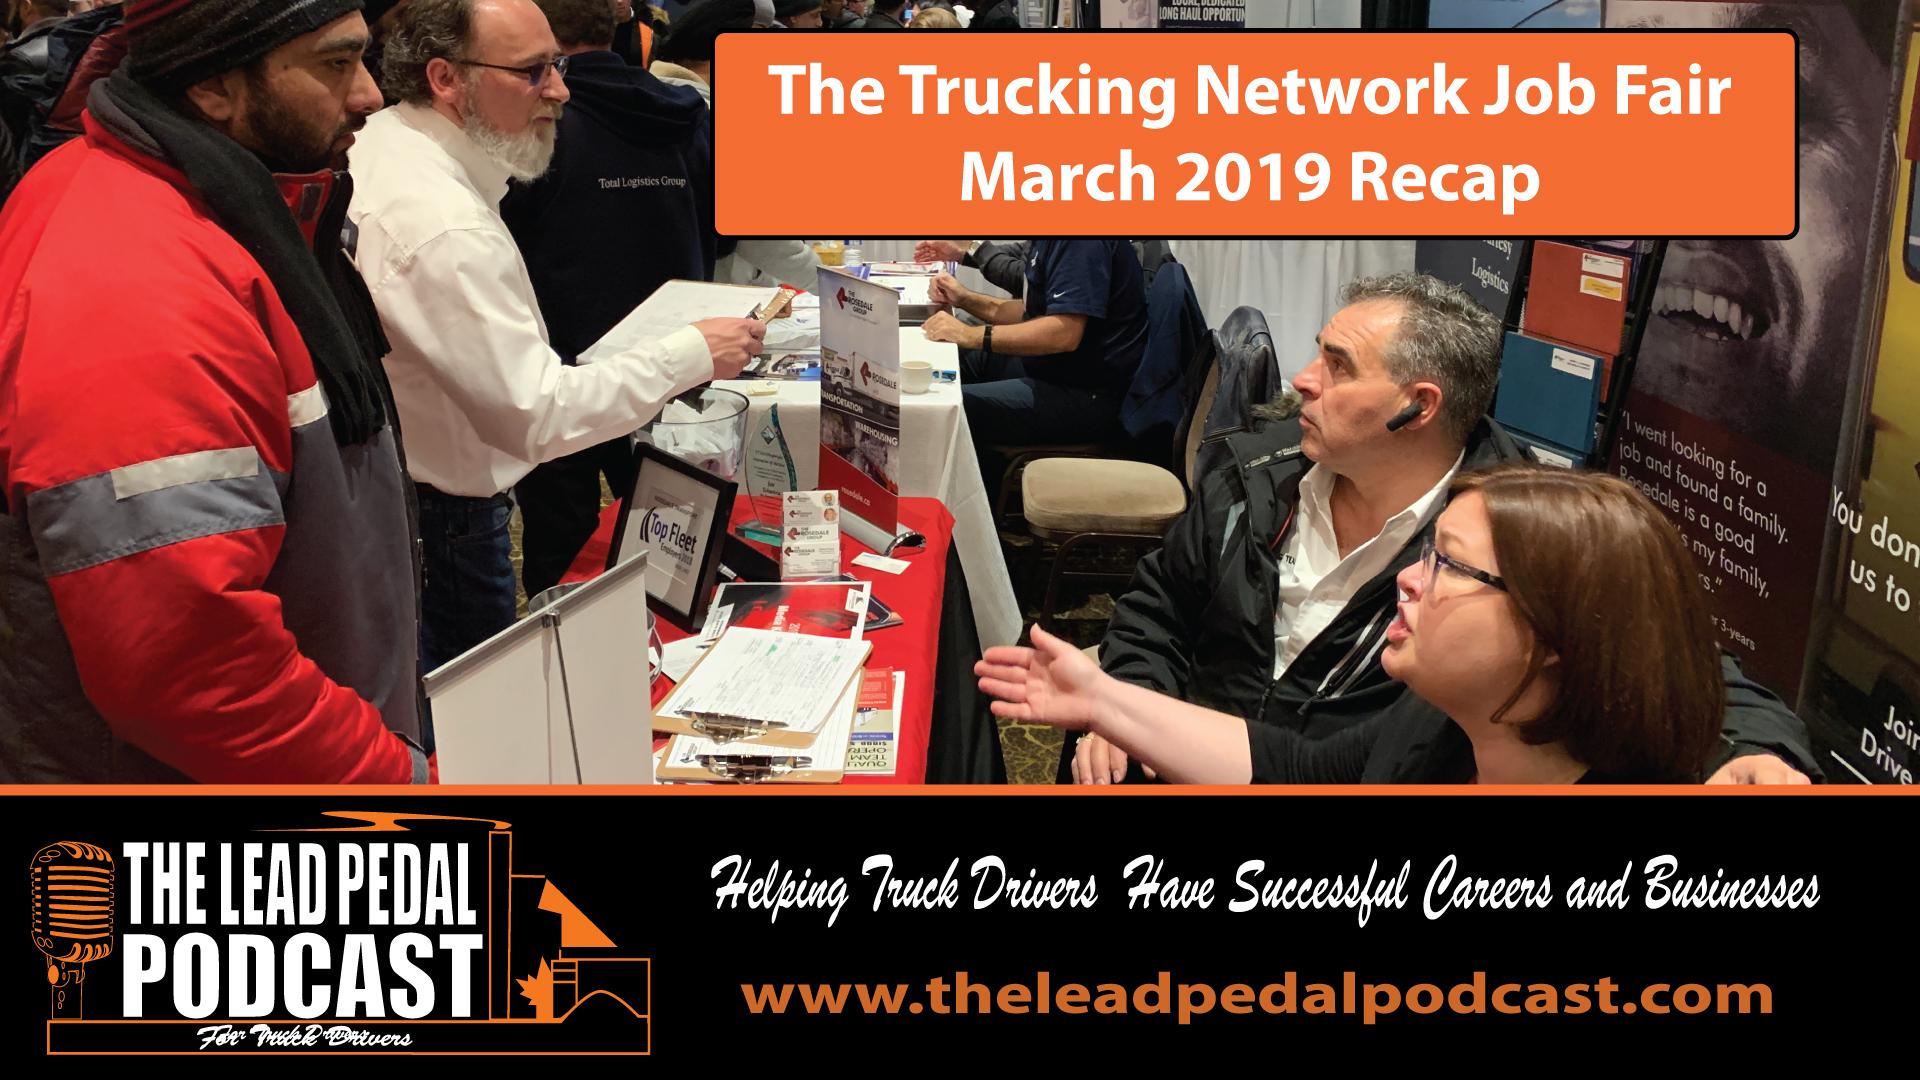 The Trucking Network Job Fair